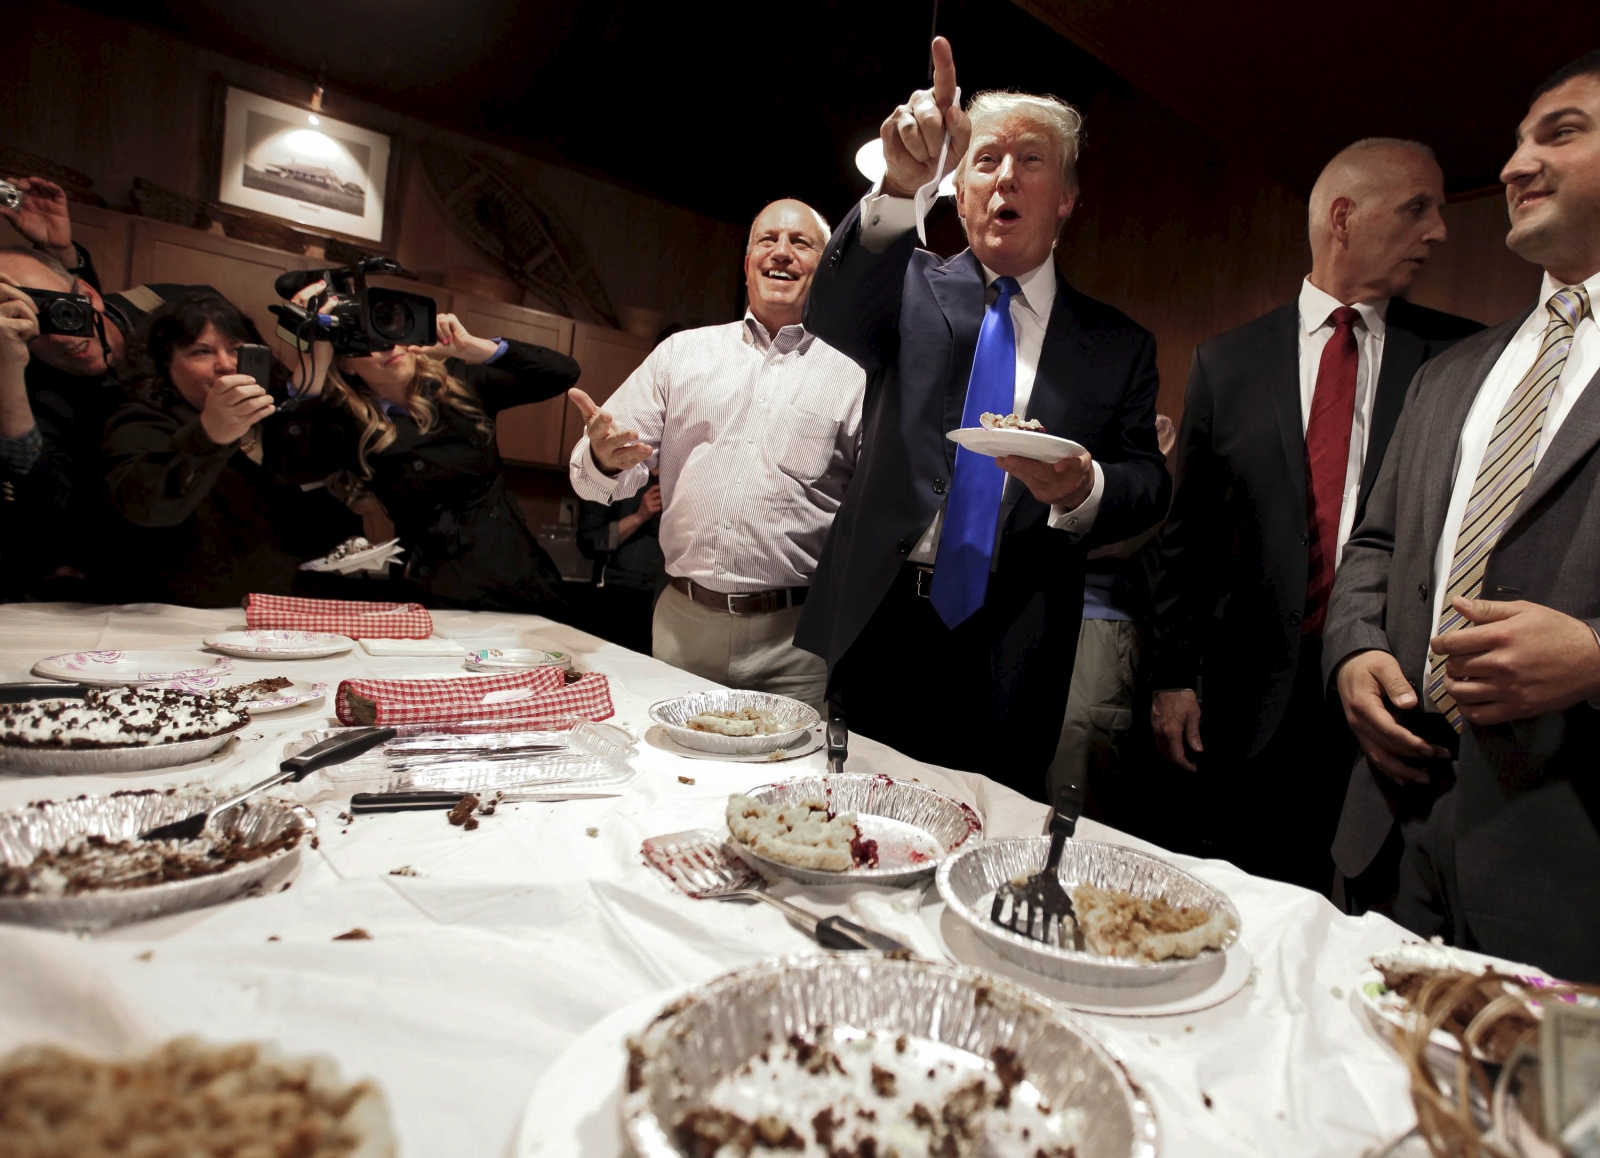 John Oliver Attacks Donald Trump Over Food Waste In Last Week Tonight